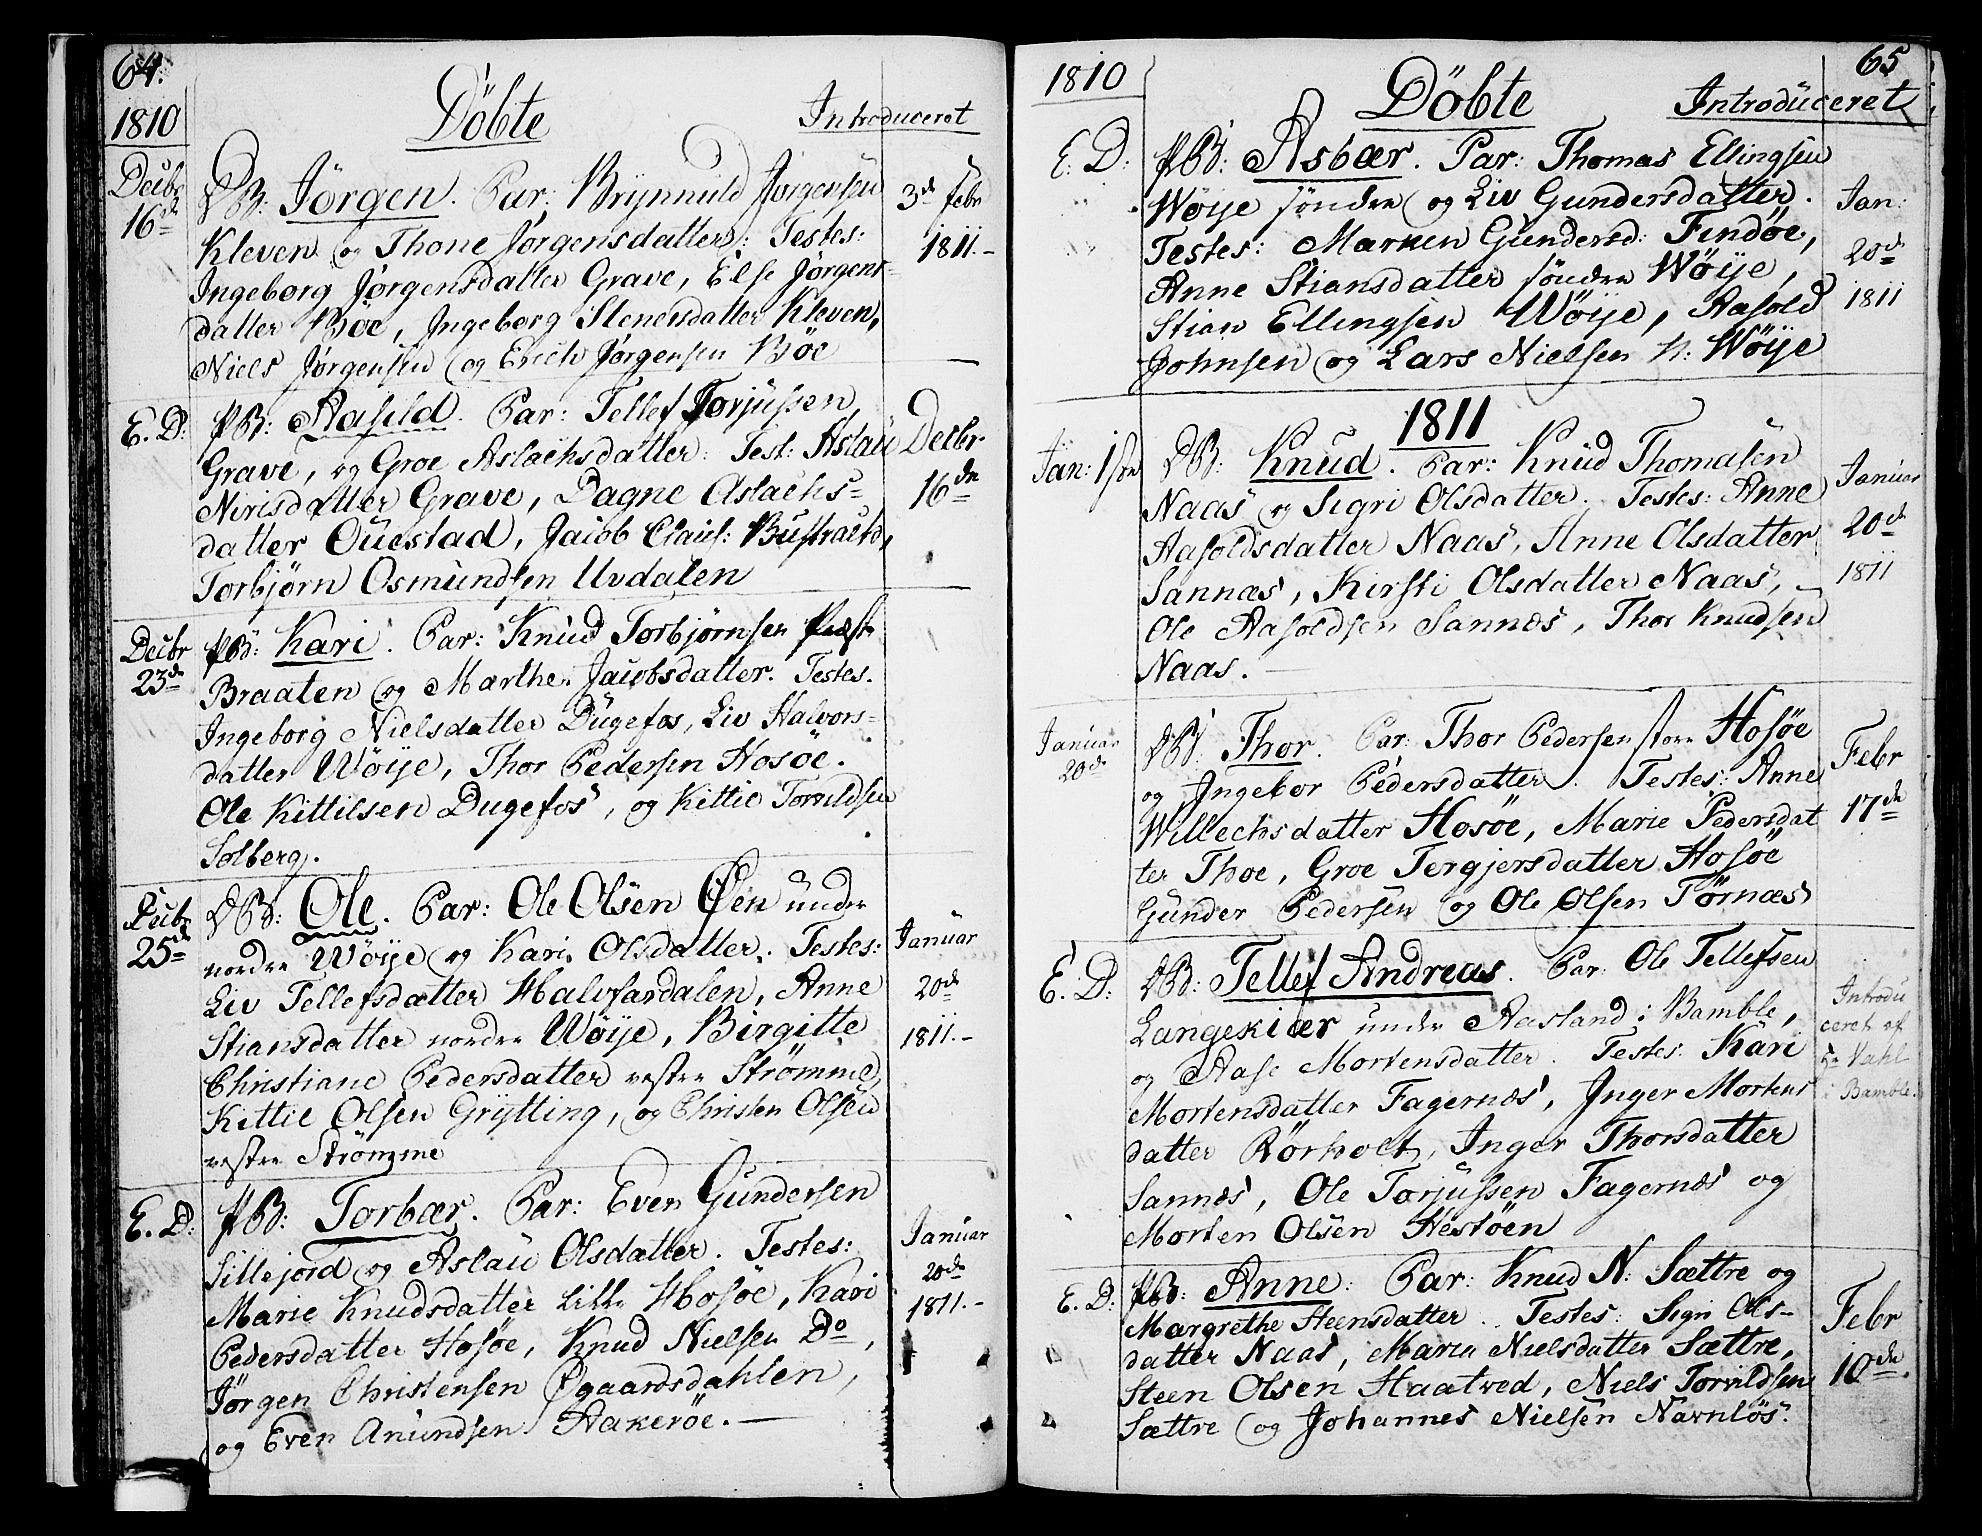 SAKO, Drangedal kirkebøker, F/Fa/L0004: Ministerialbok nr. 4, 1802-1814, s. 64-65